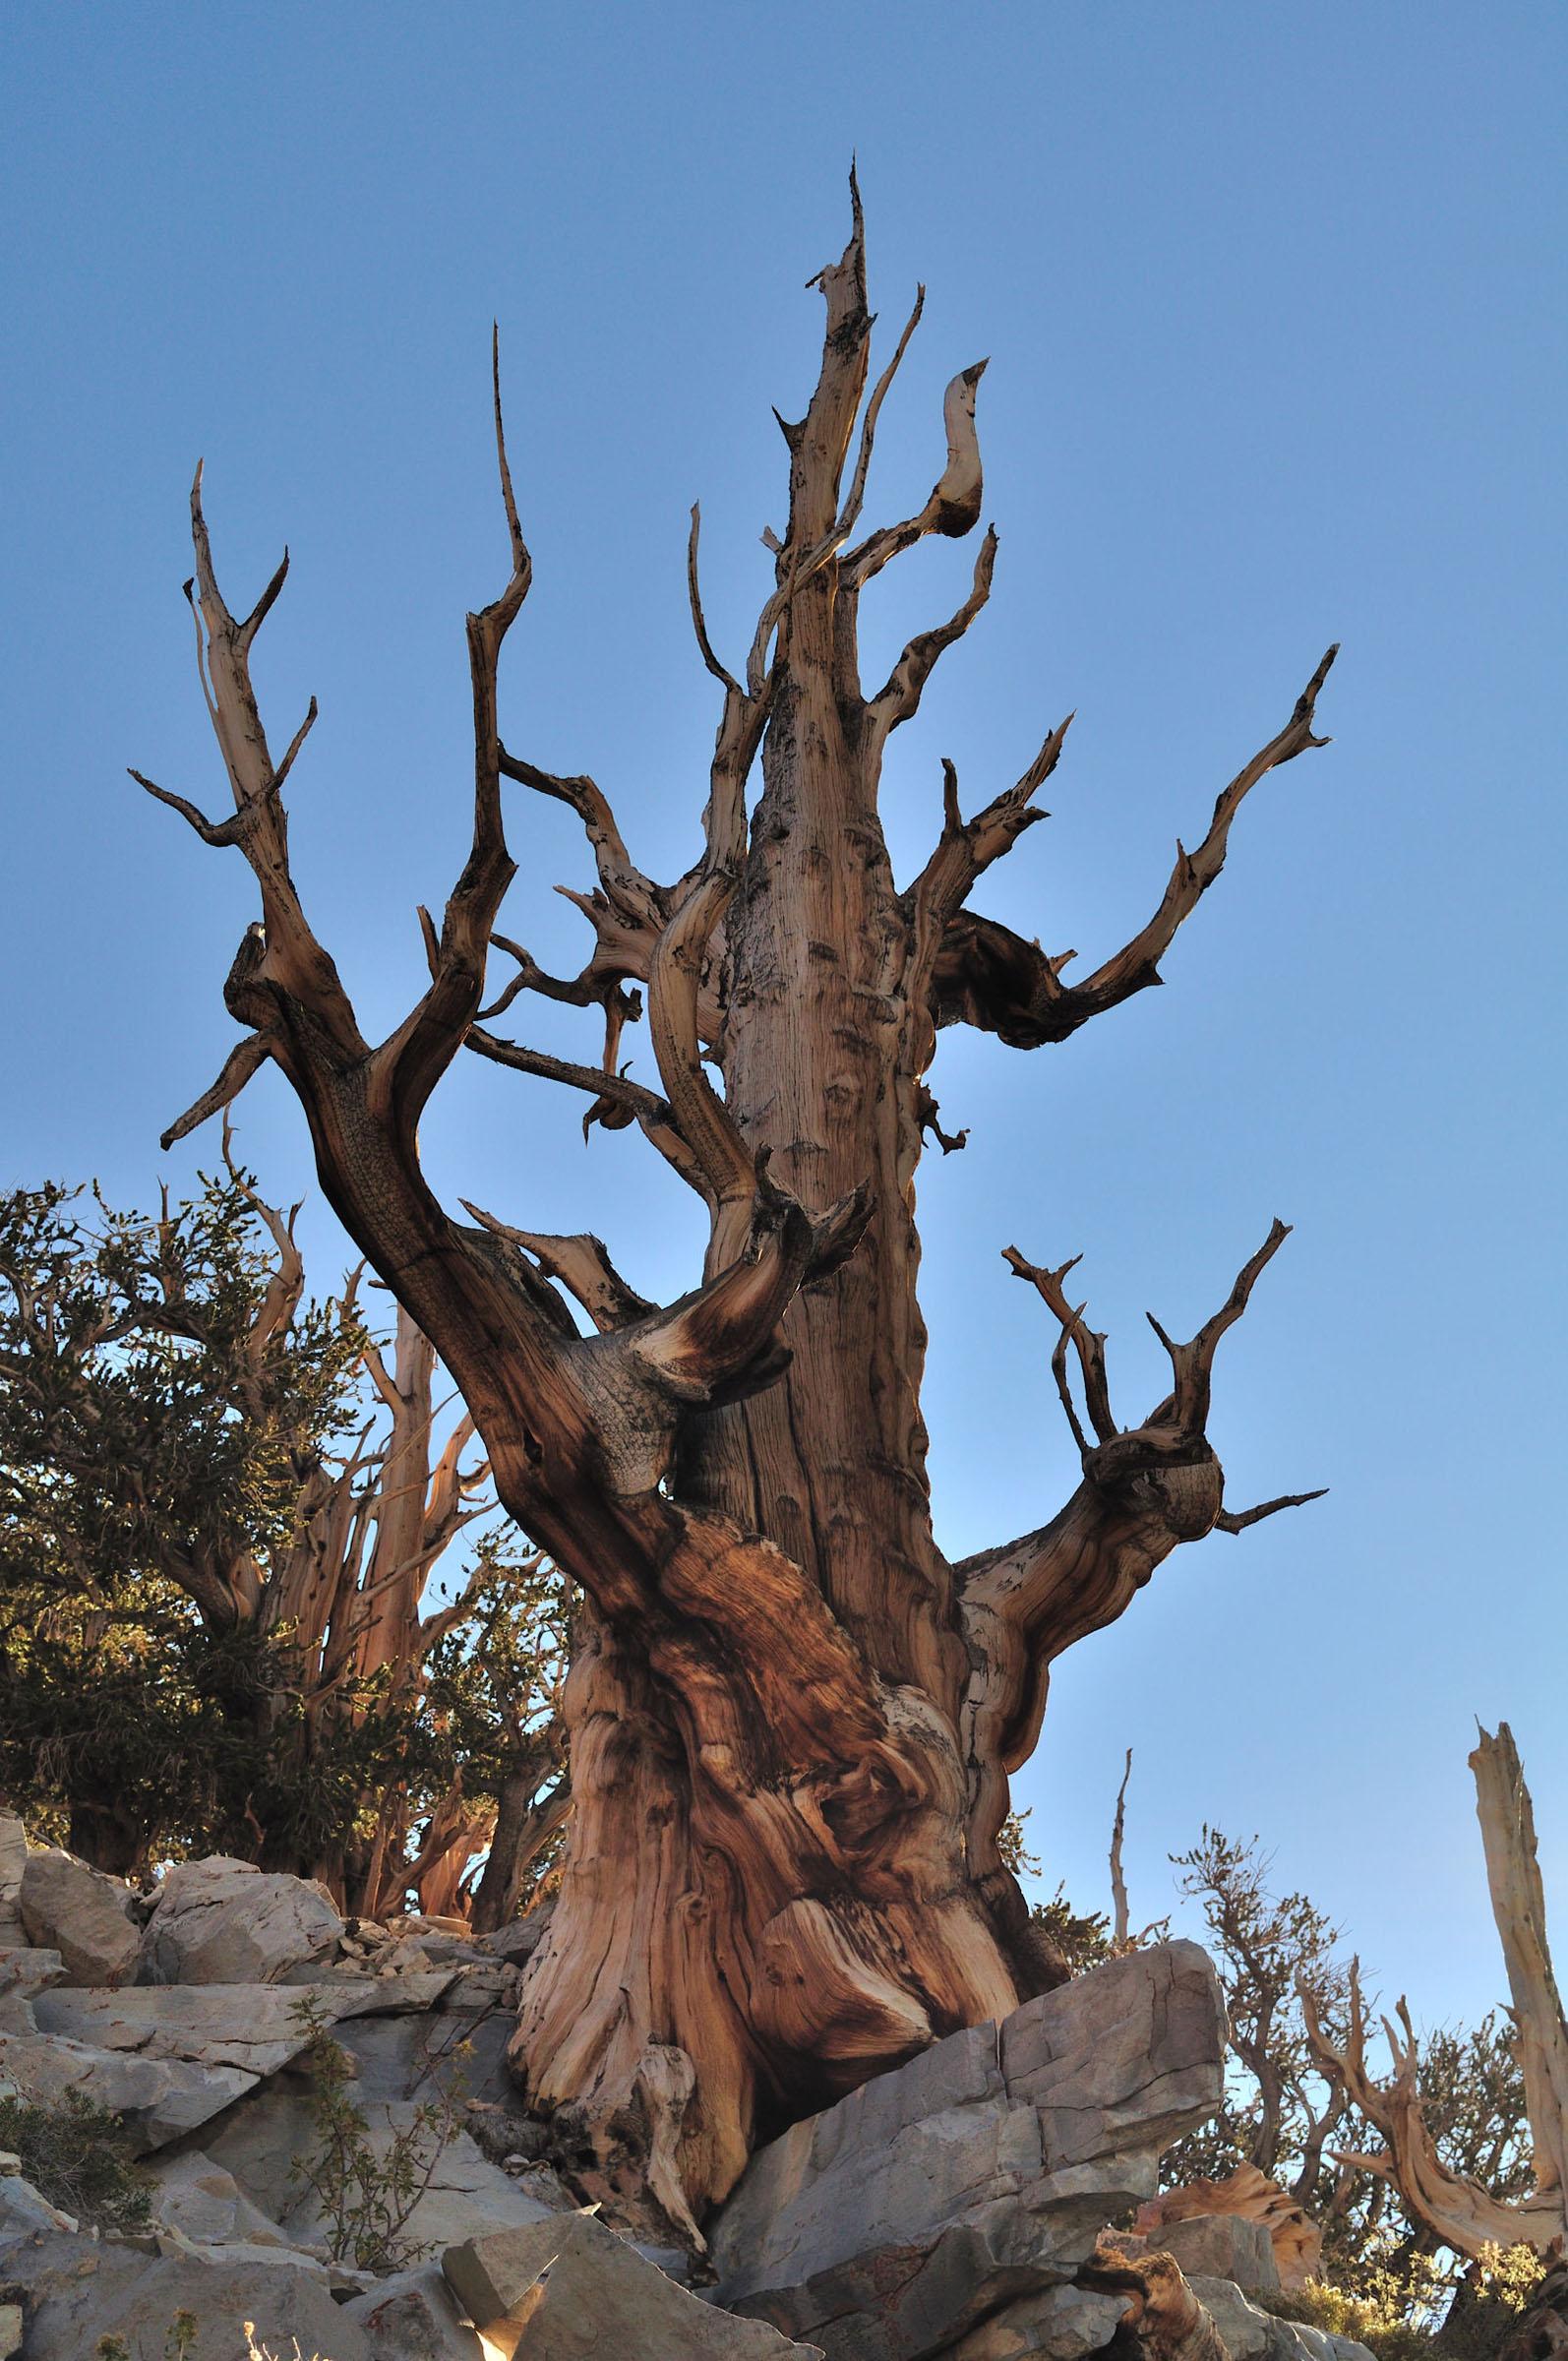 matuzsalem_erdo_ancient_bristlecone_pine_forest_1